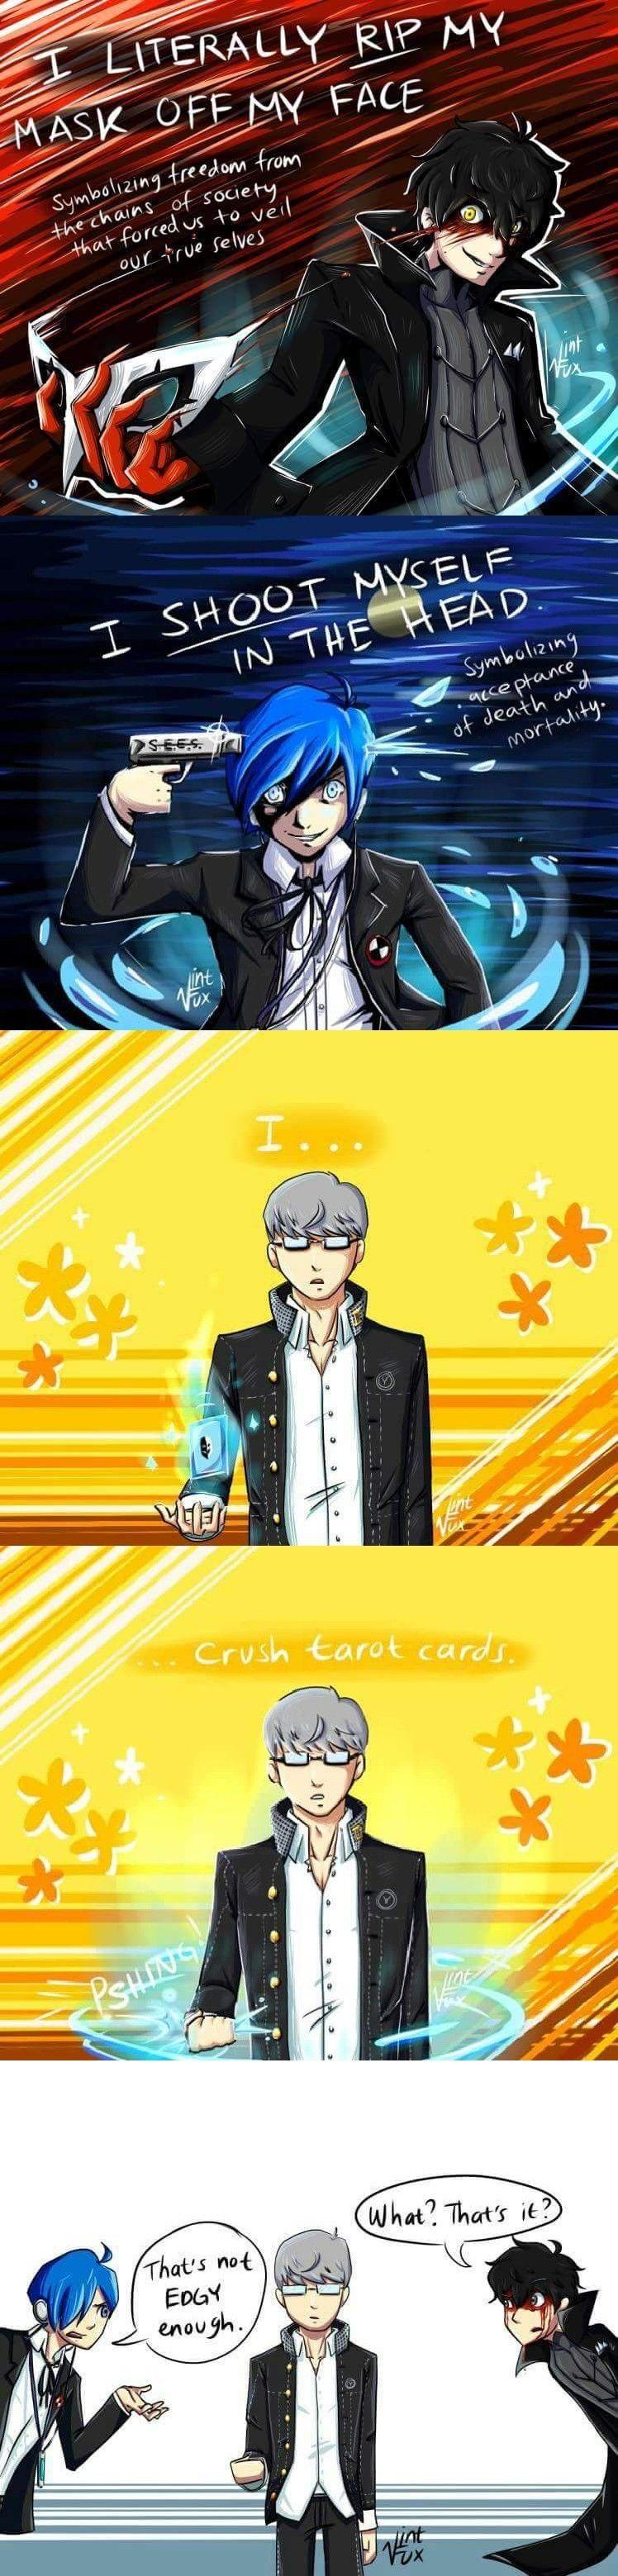 No symbolism get out persona pinterest persona anime and no symbolism get out buycottarizona